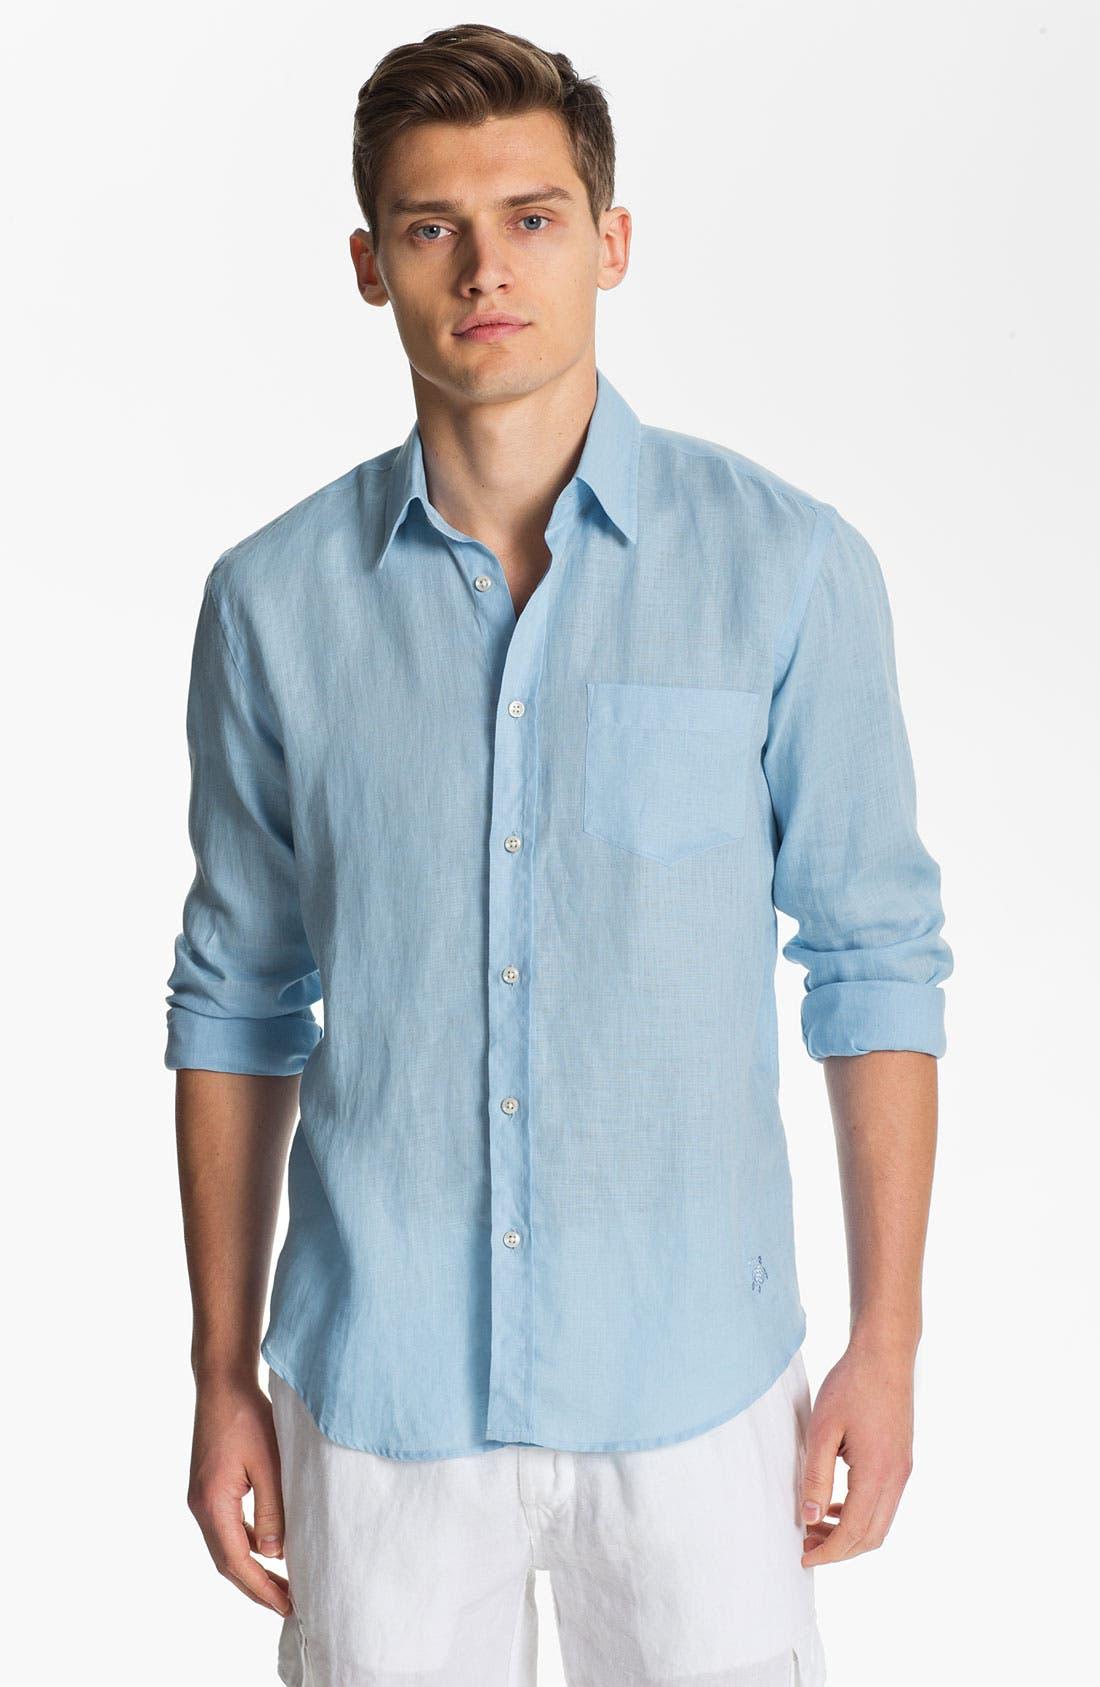 Main Image - Vilebrequin 'Caroubier' Linen Sport Shirt